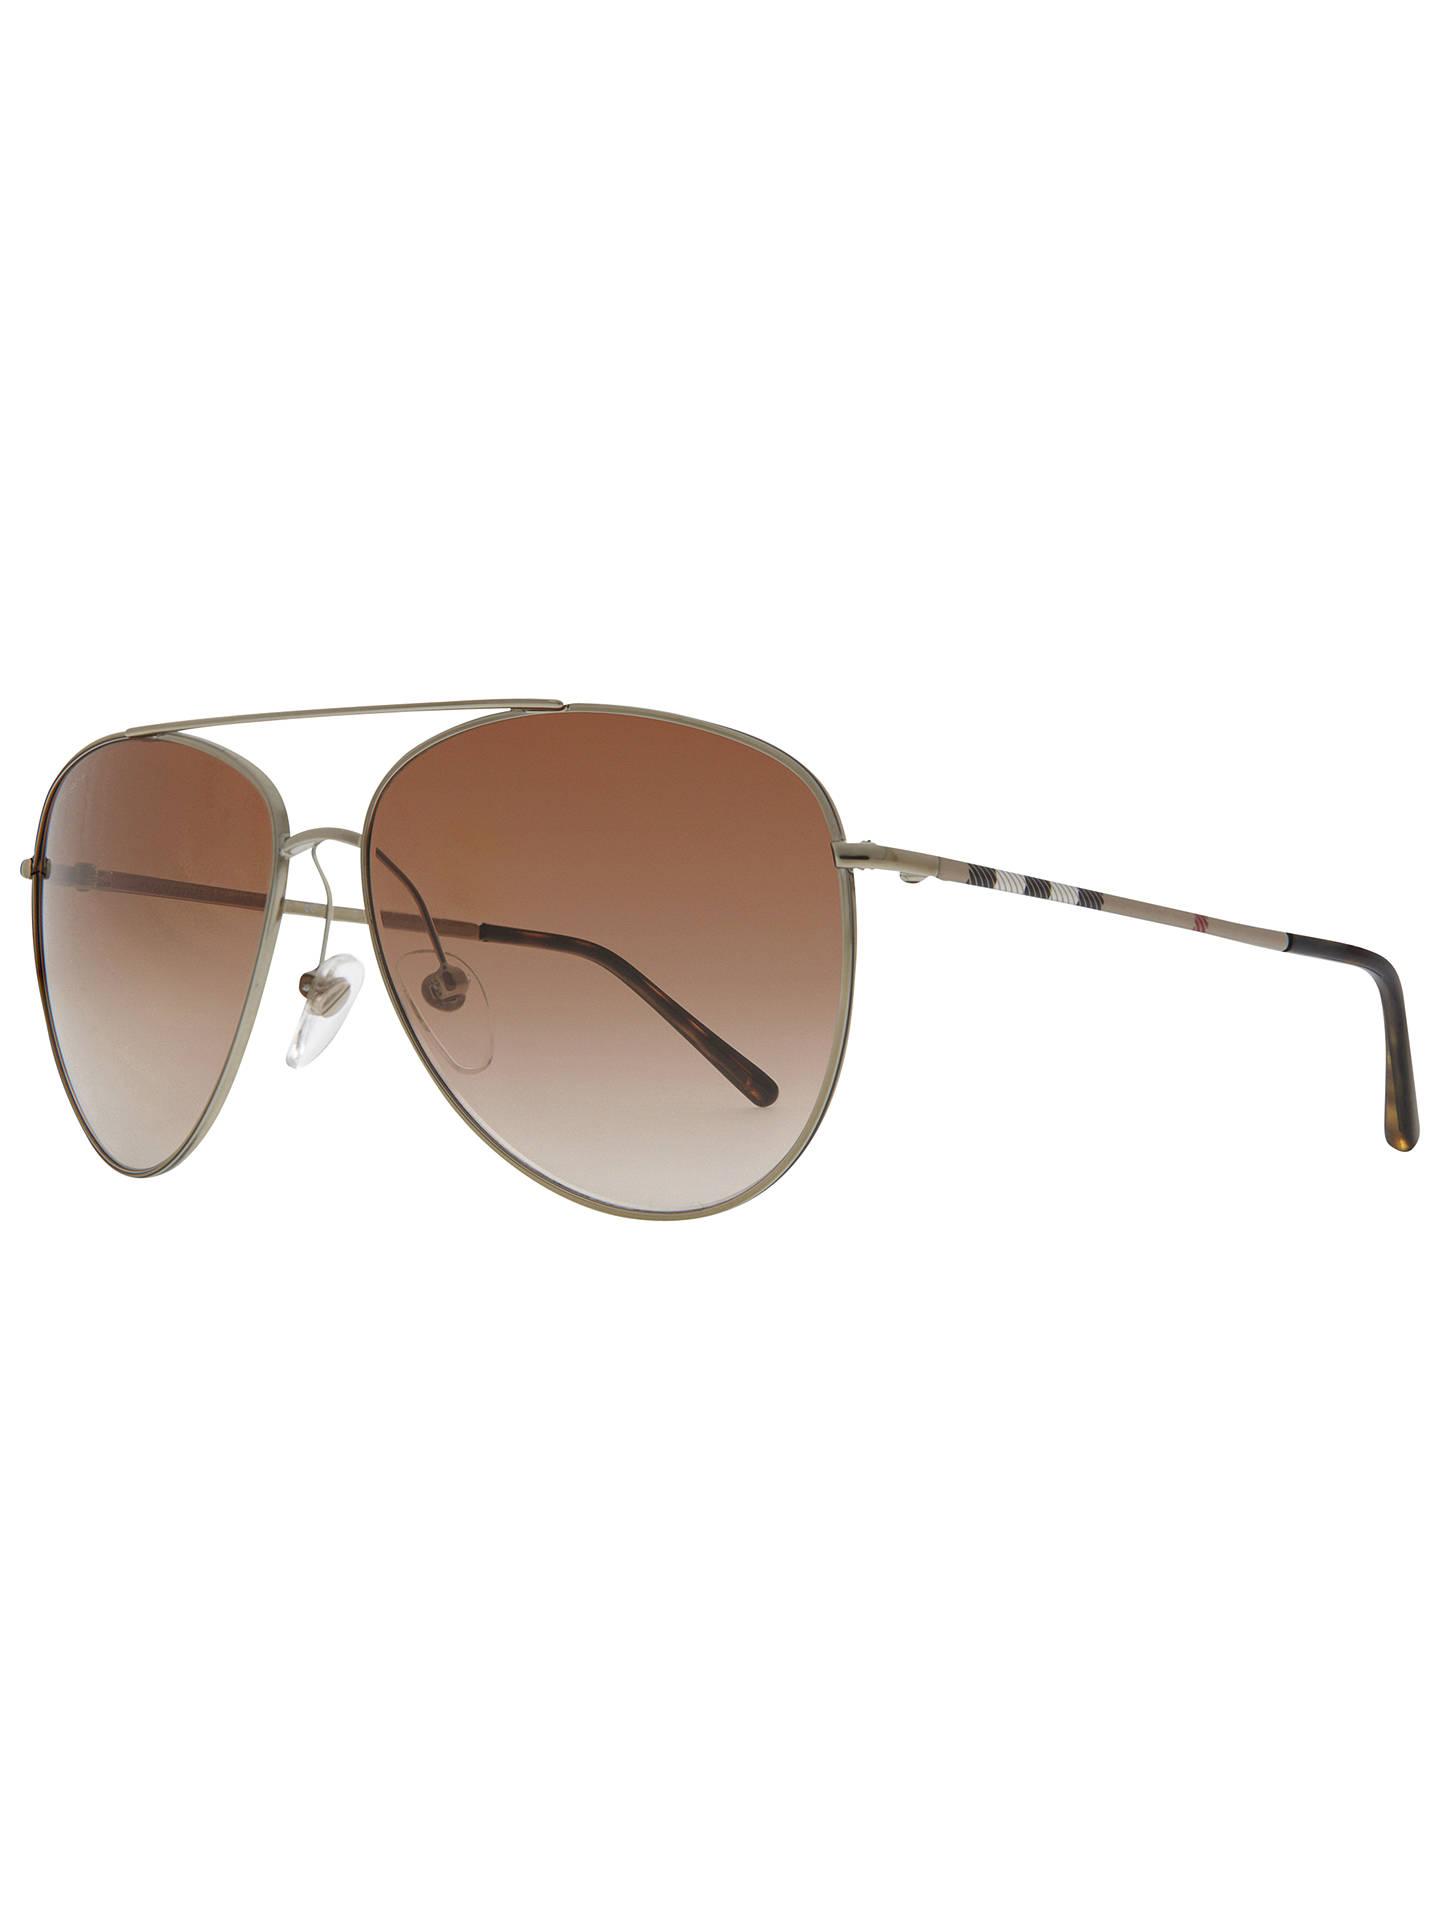 3d501741207 Buy Burberry BE3072 Aviator Sunglasses